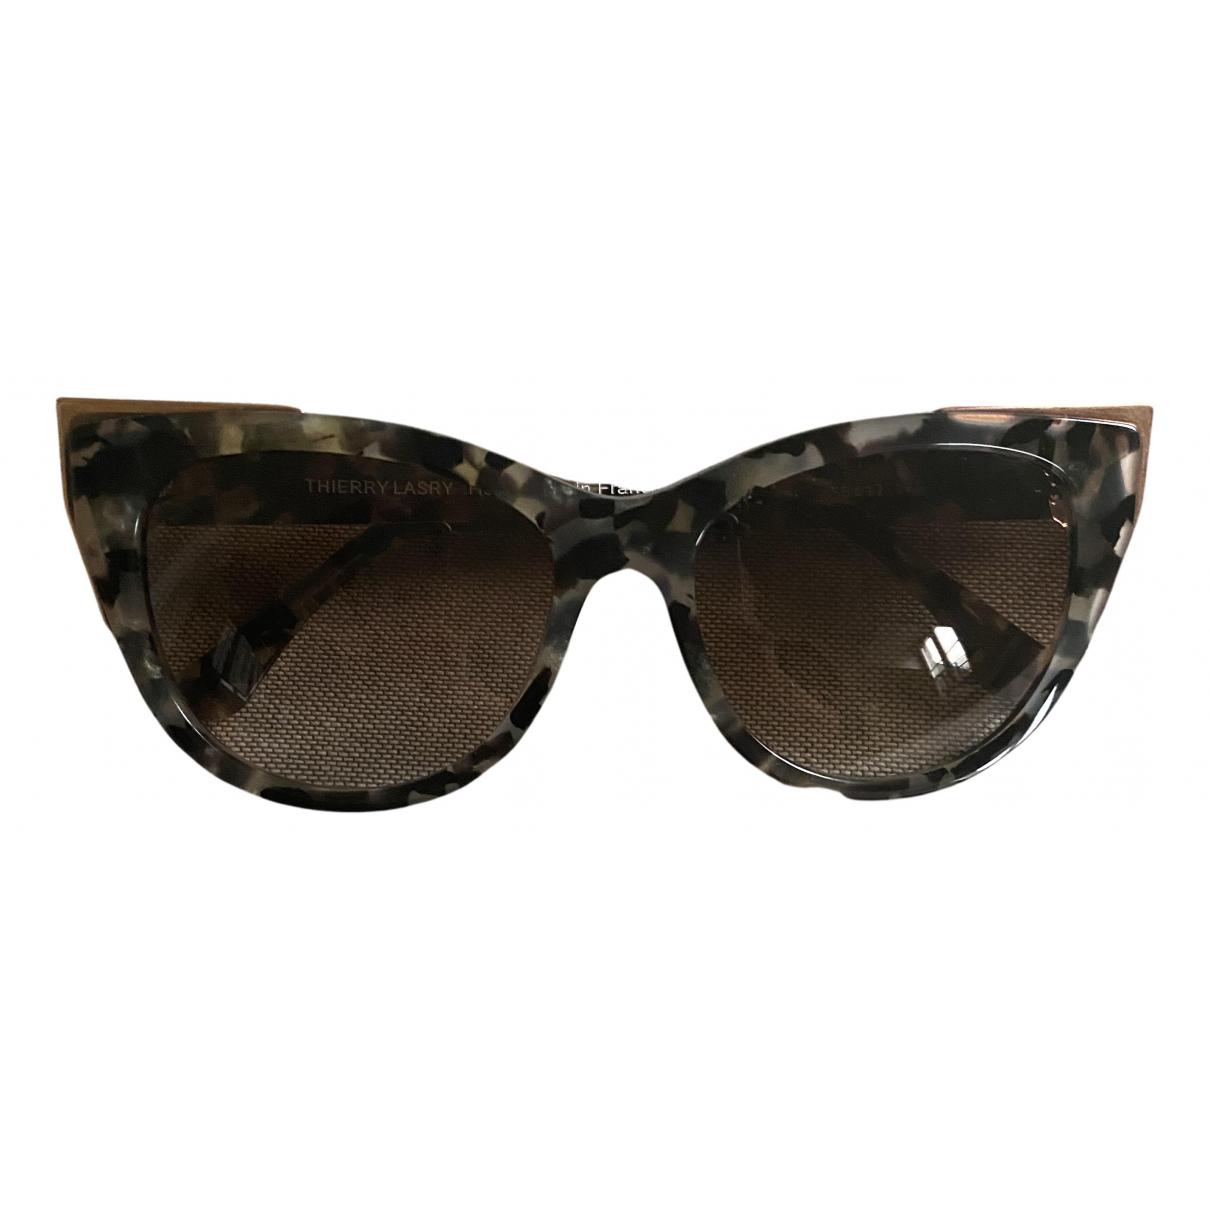 Gafas Thierry Lasry